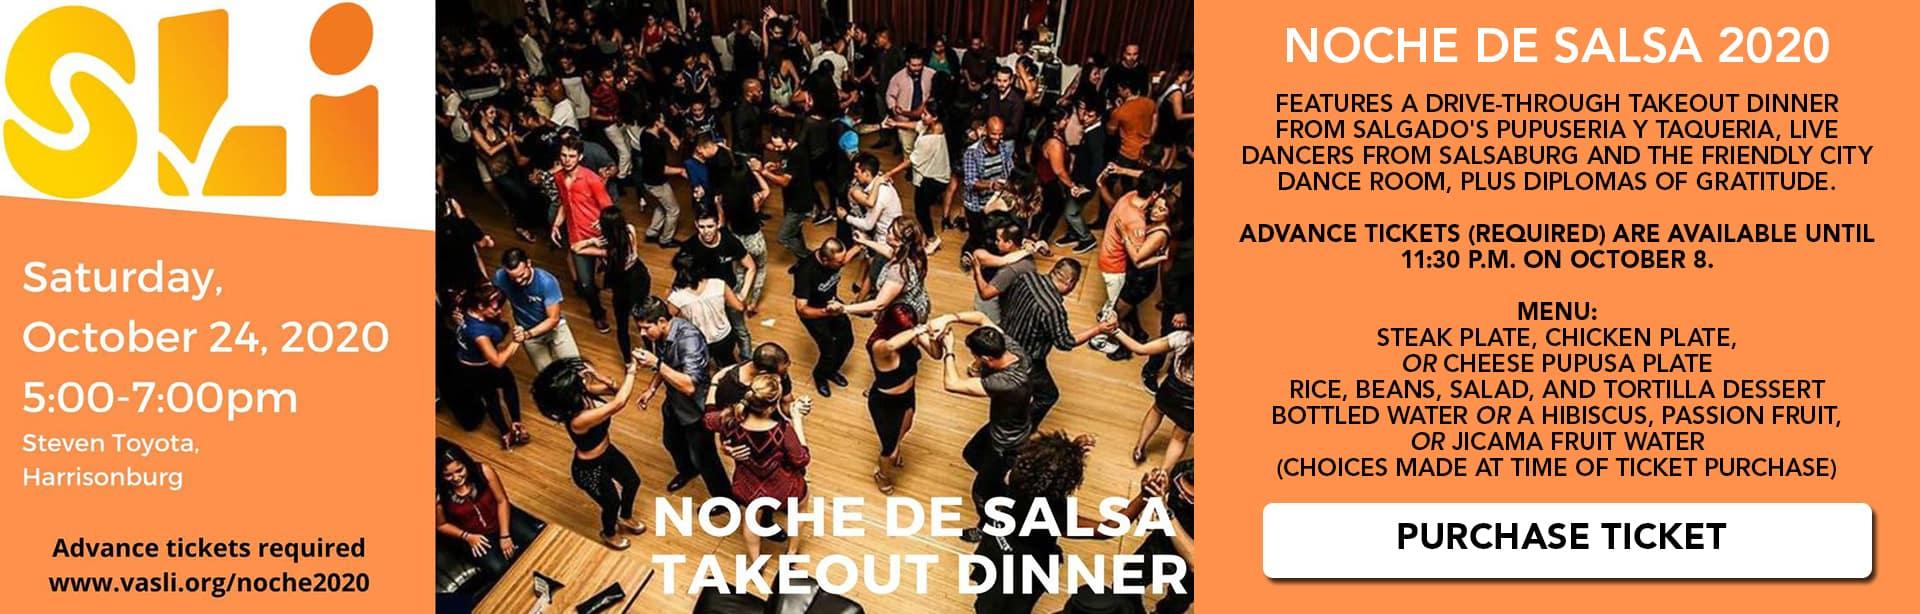 steven_toyota_salsa_web_banner